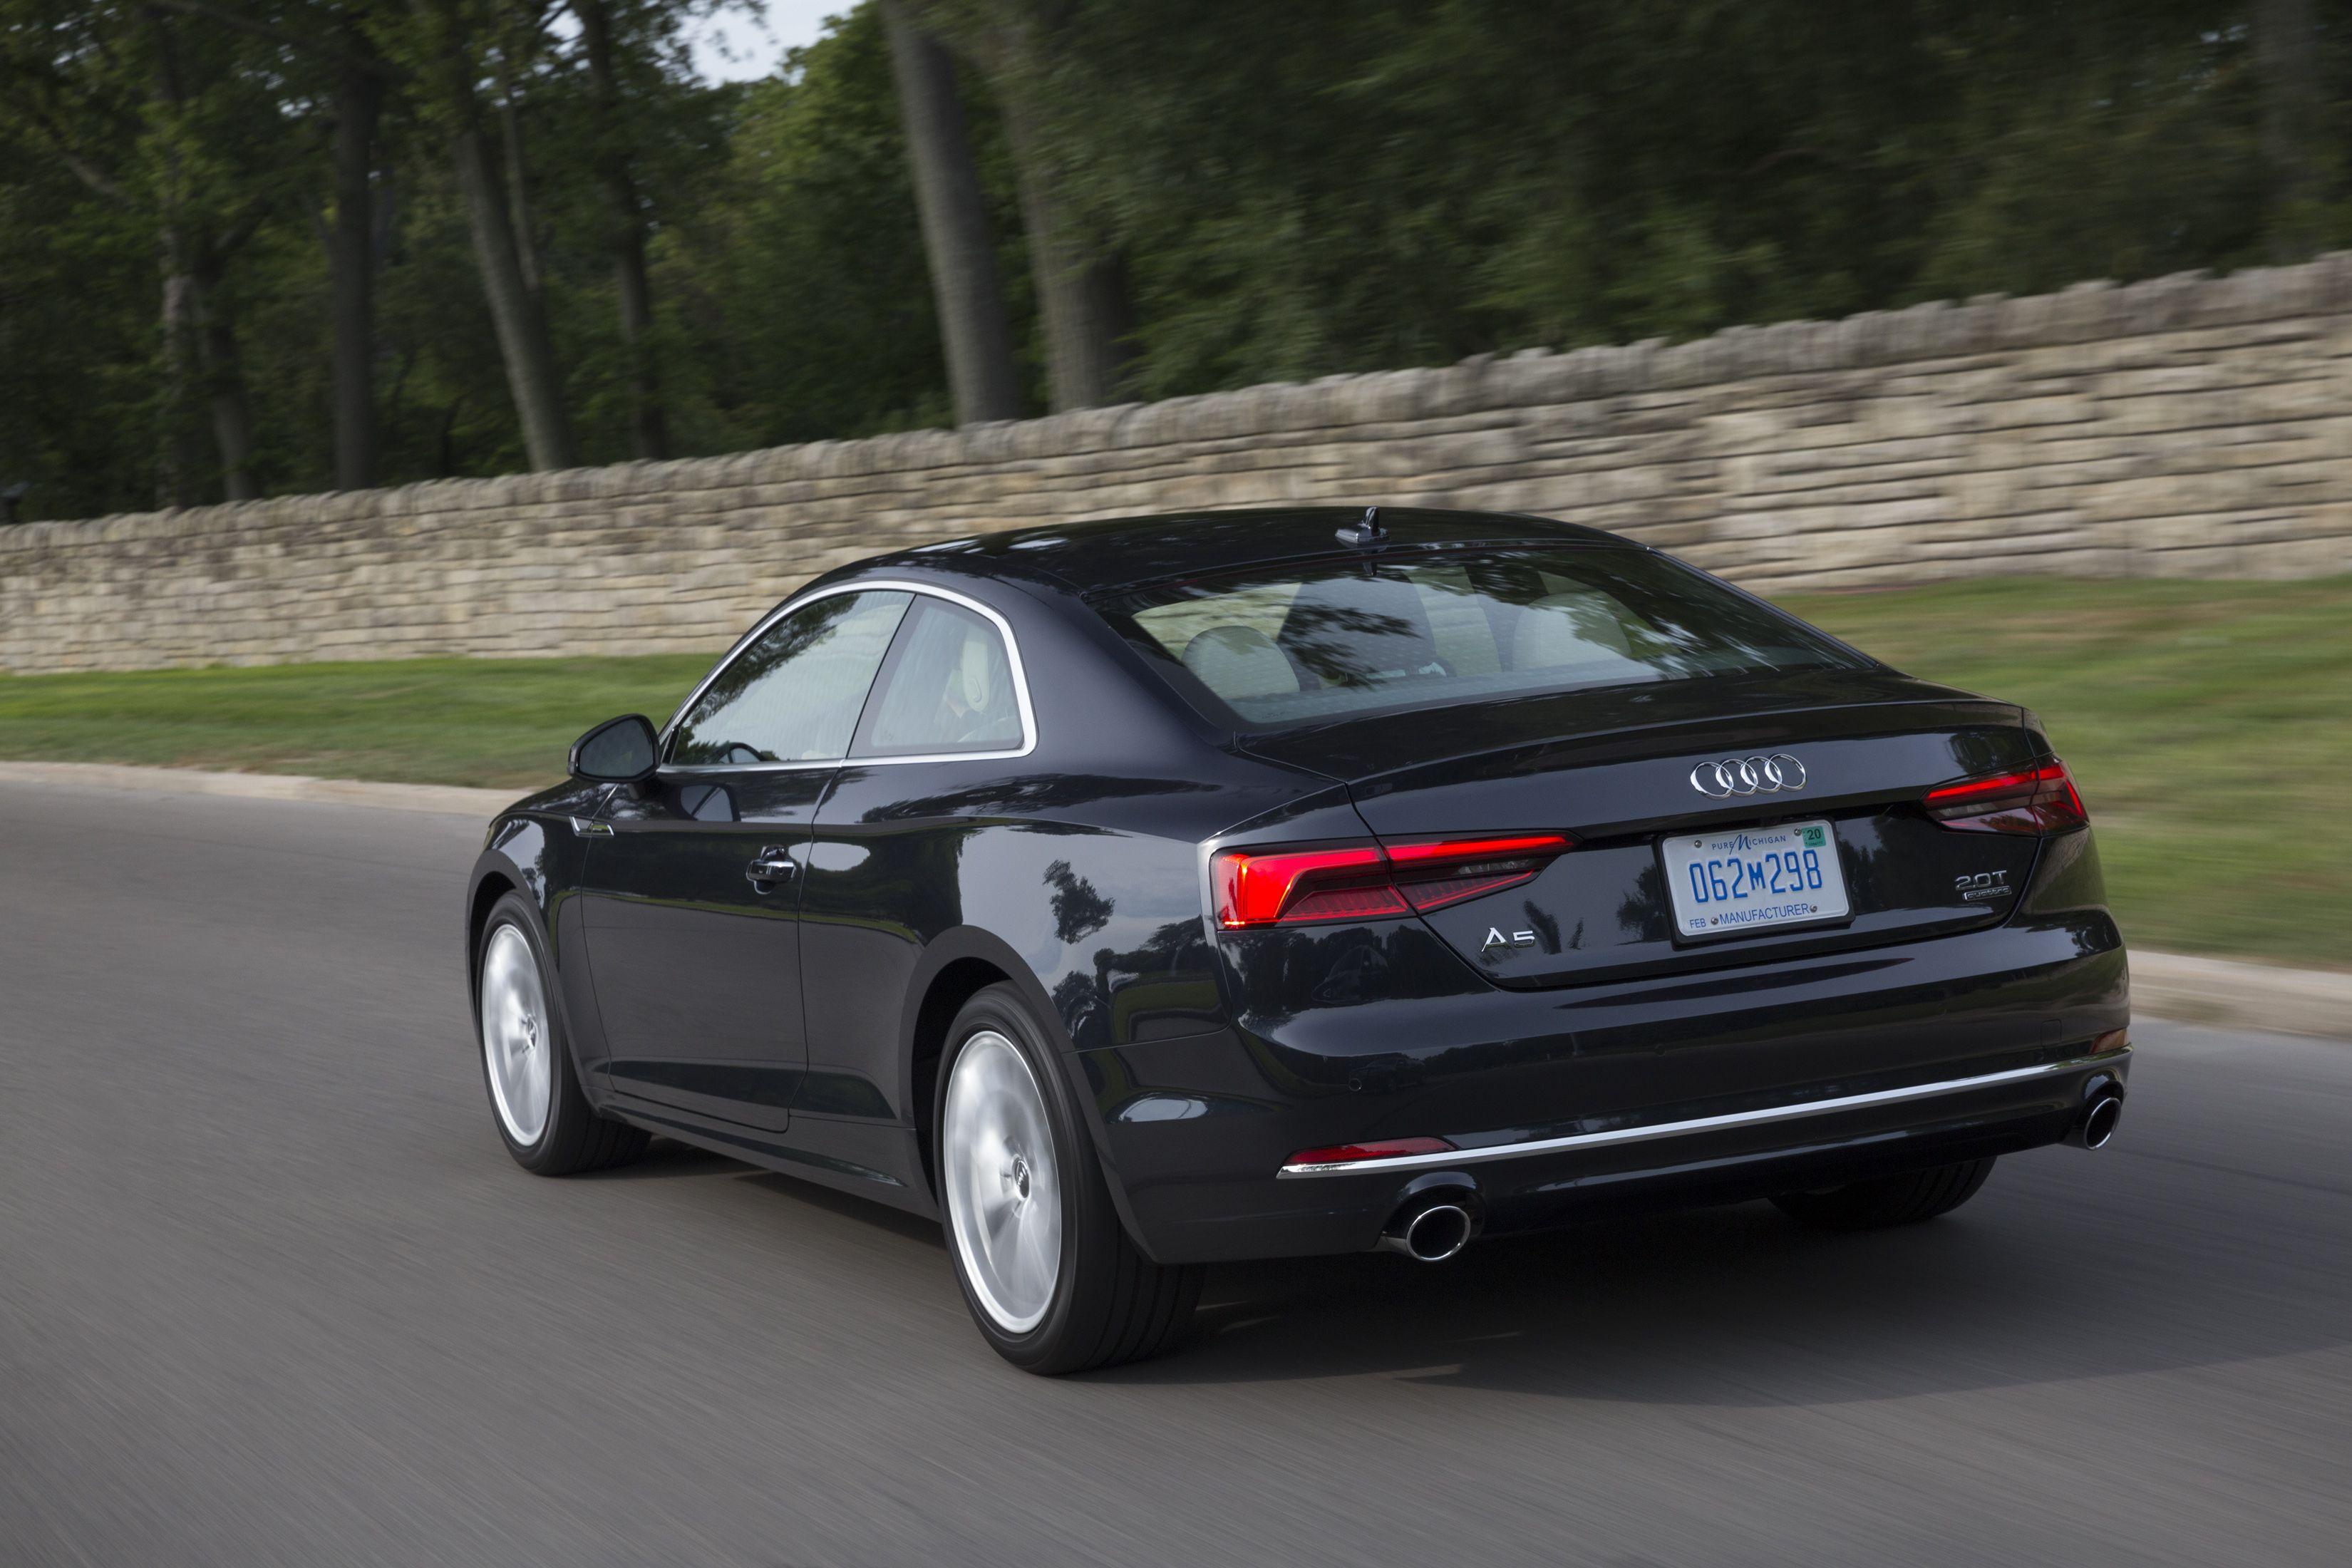 2020 Audi S5 Cabriolet Rumors And Price In 2020 Audi A5 Audi Audi S5